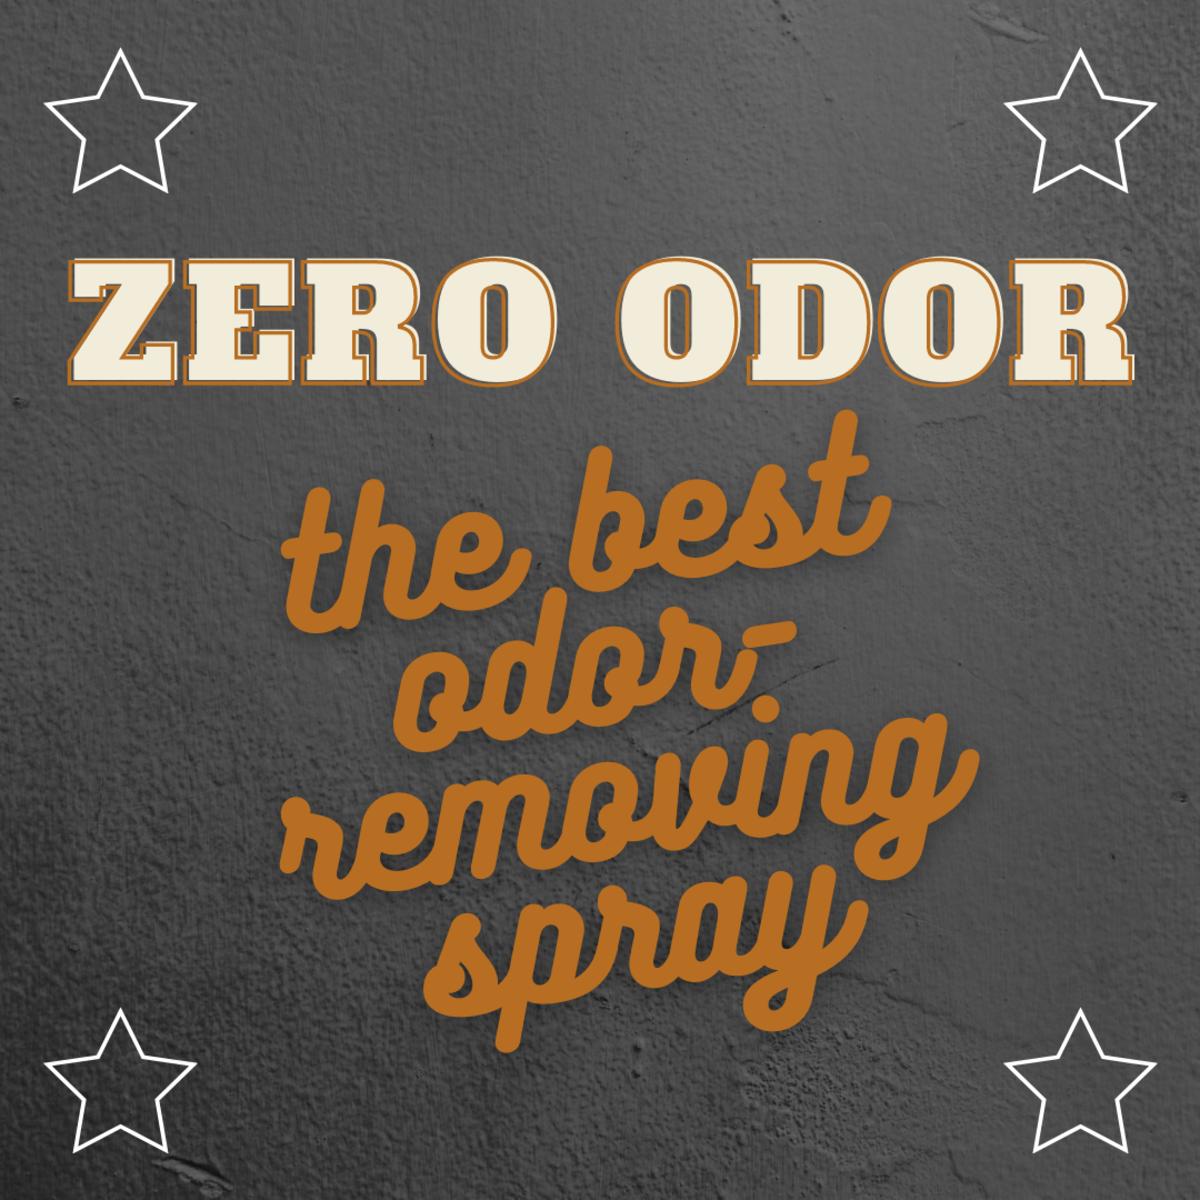 Zero Odor is the best odor eliminator spray that I've found